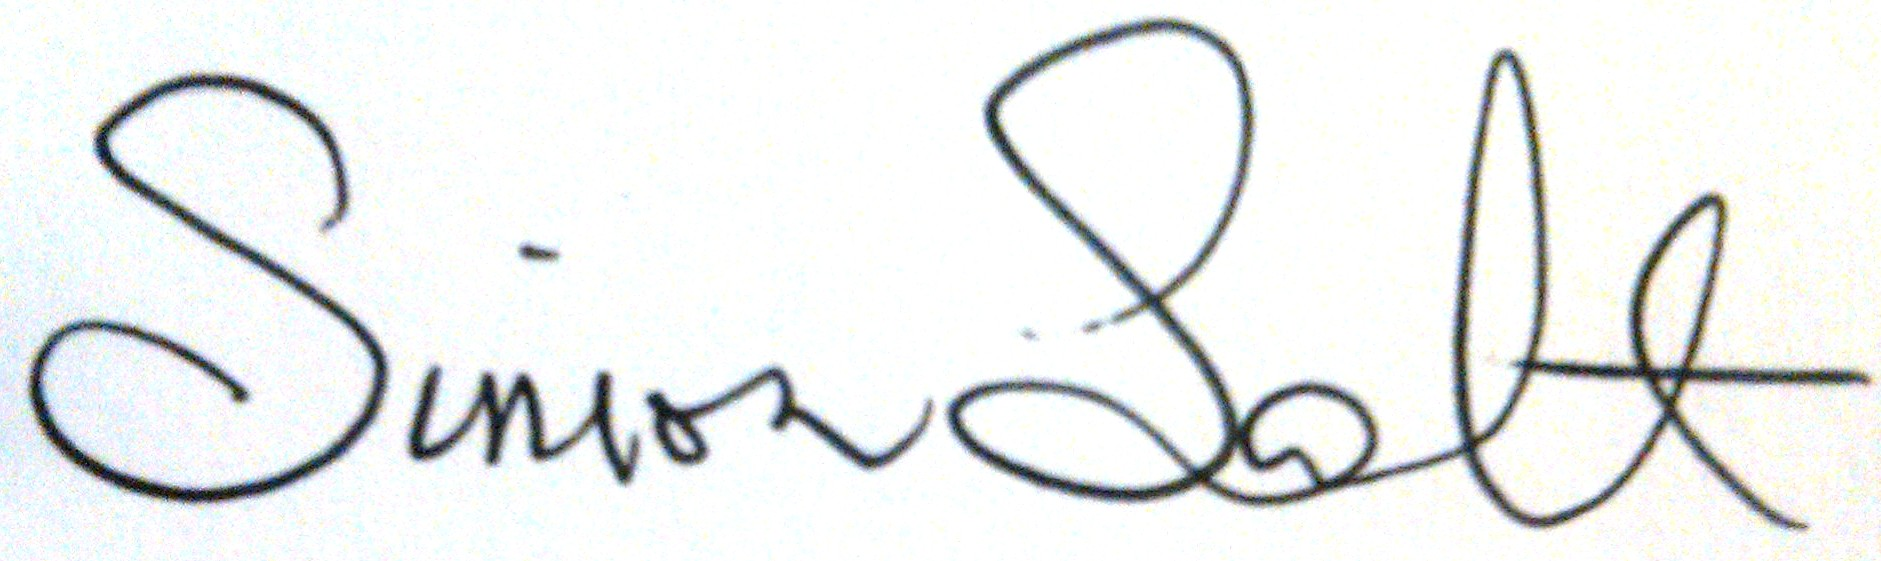 Simon Salt Signature